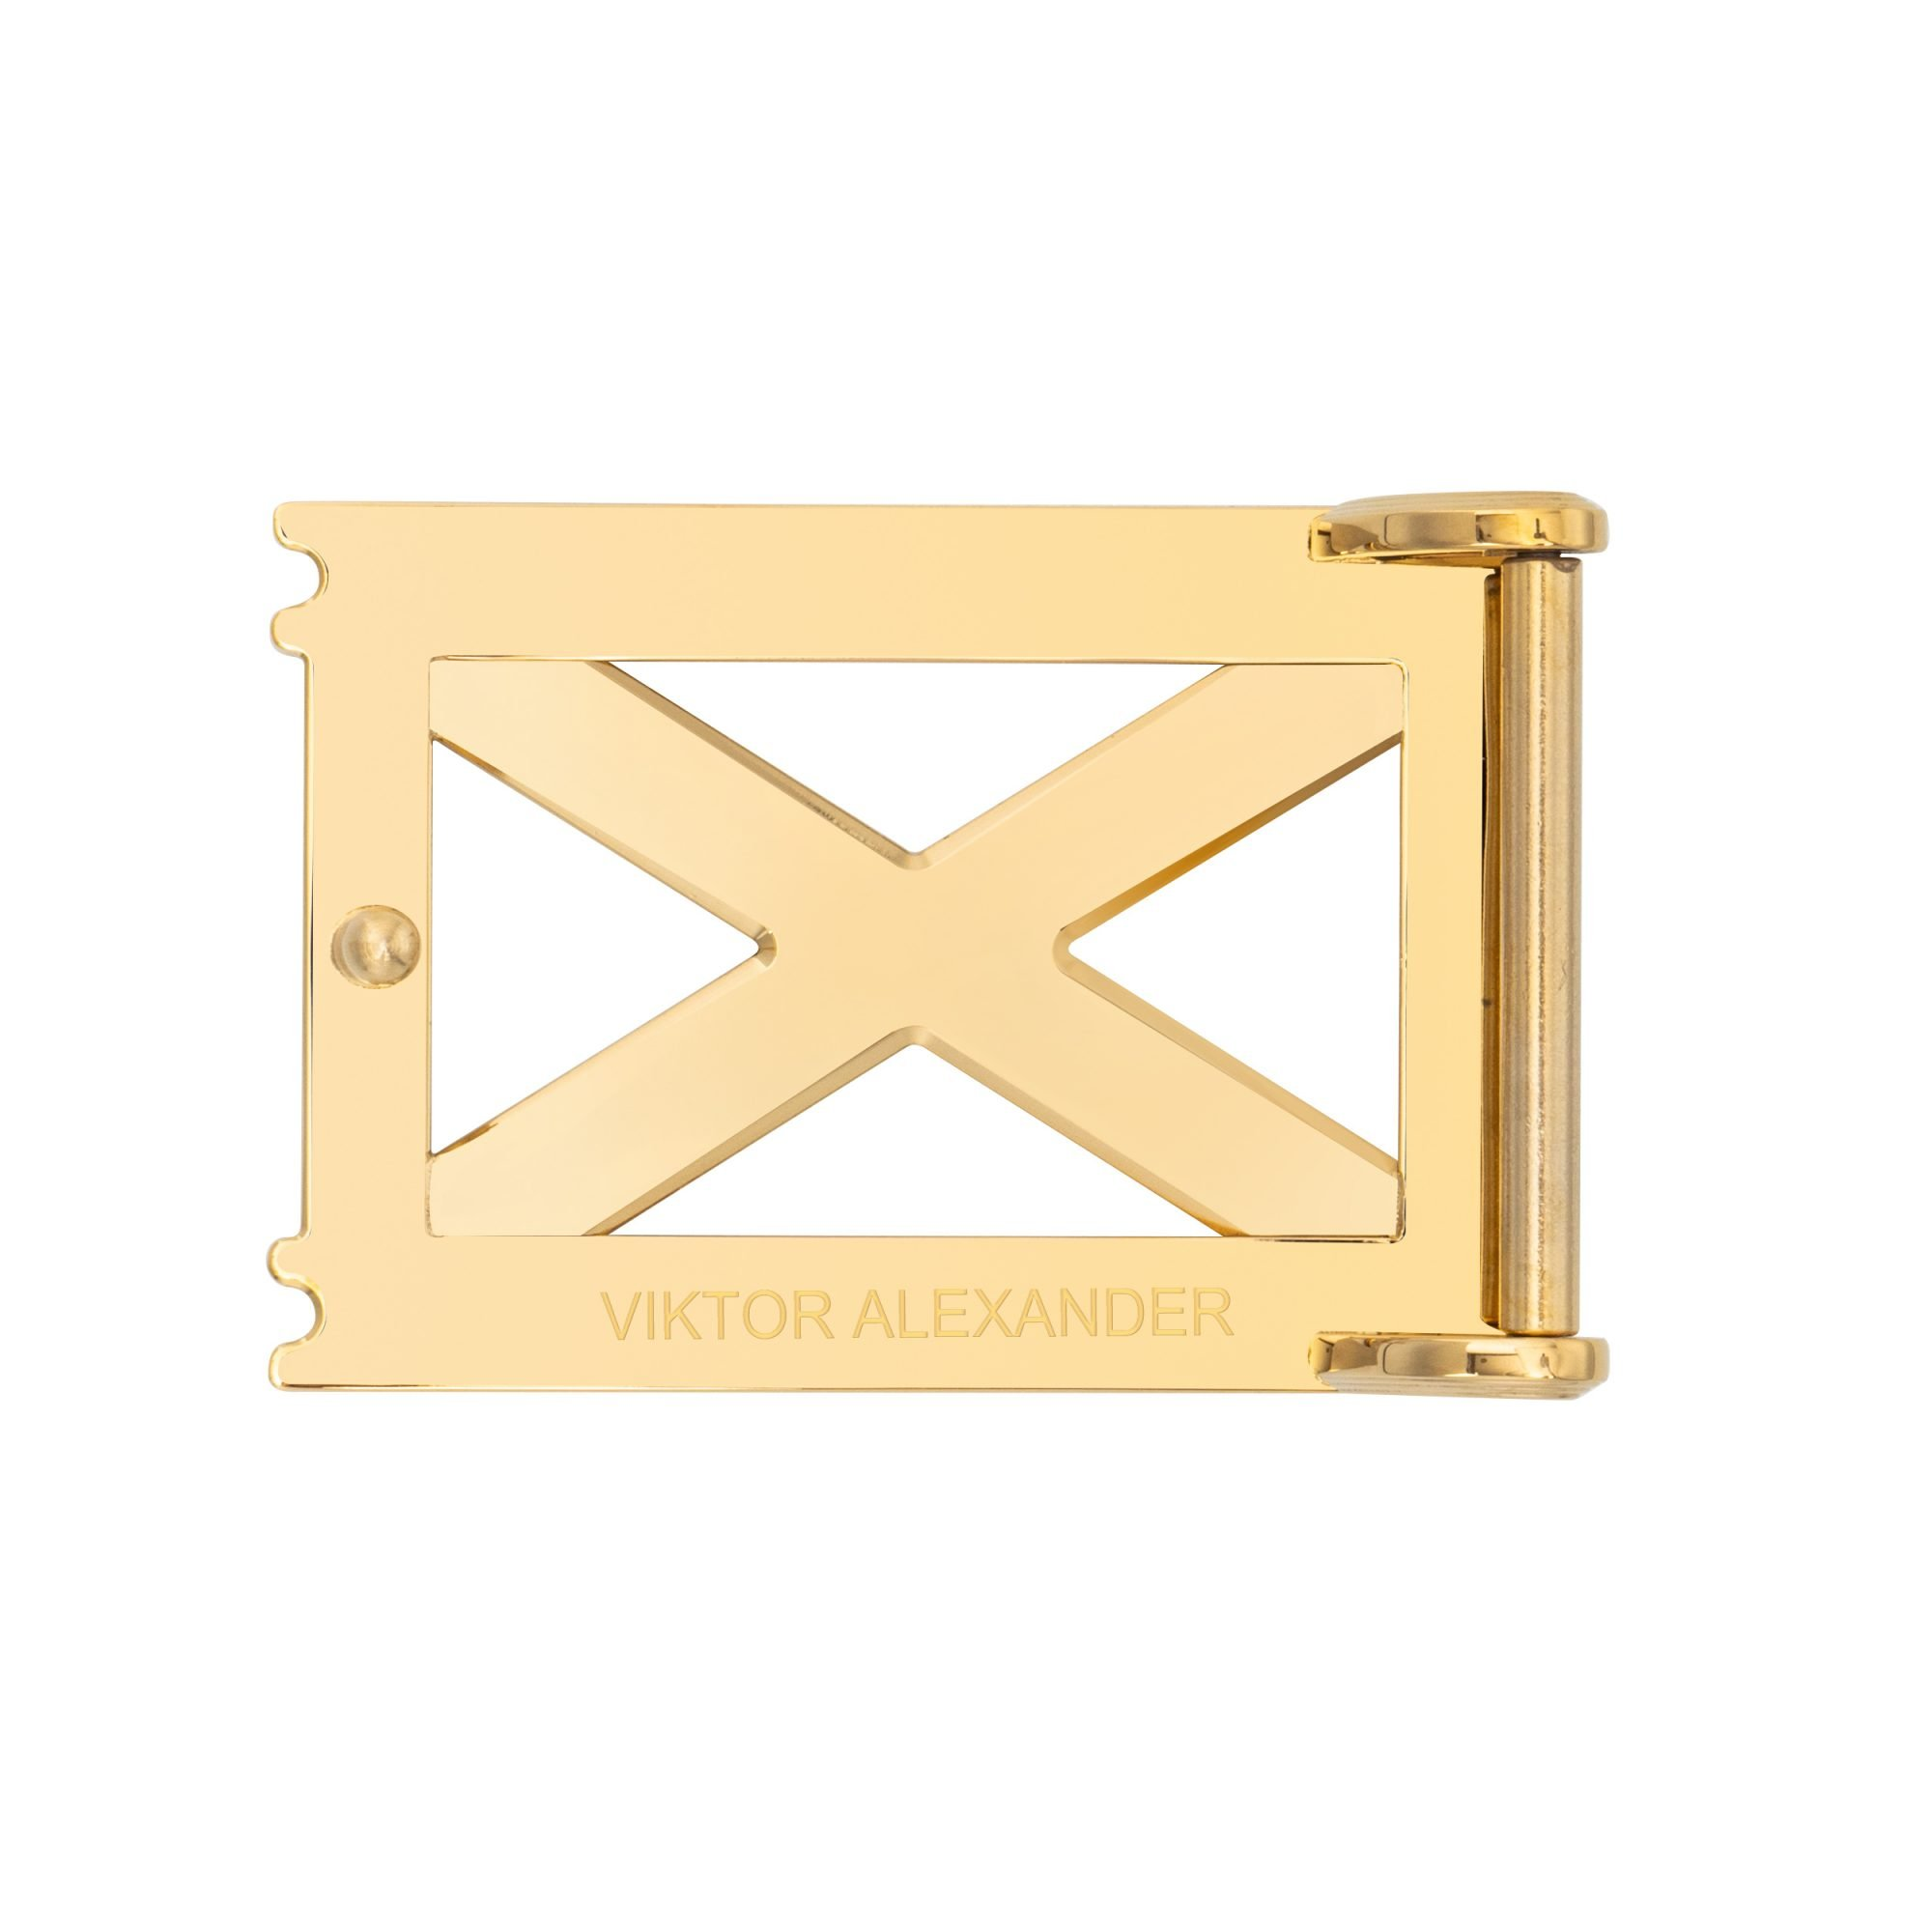 VIKTOR ALEXANDER 38MM STAINLESS STEEL BELT BUCKLE REPERTOIRE X YELLOW GOLD BACK PROFILE